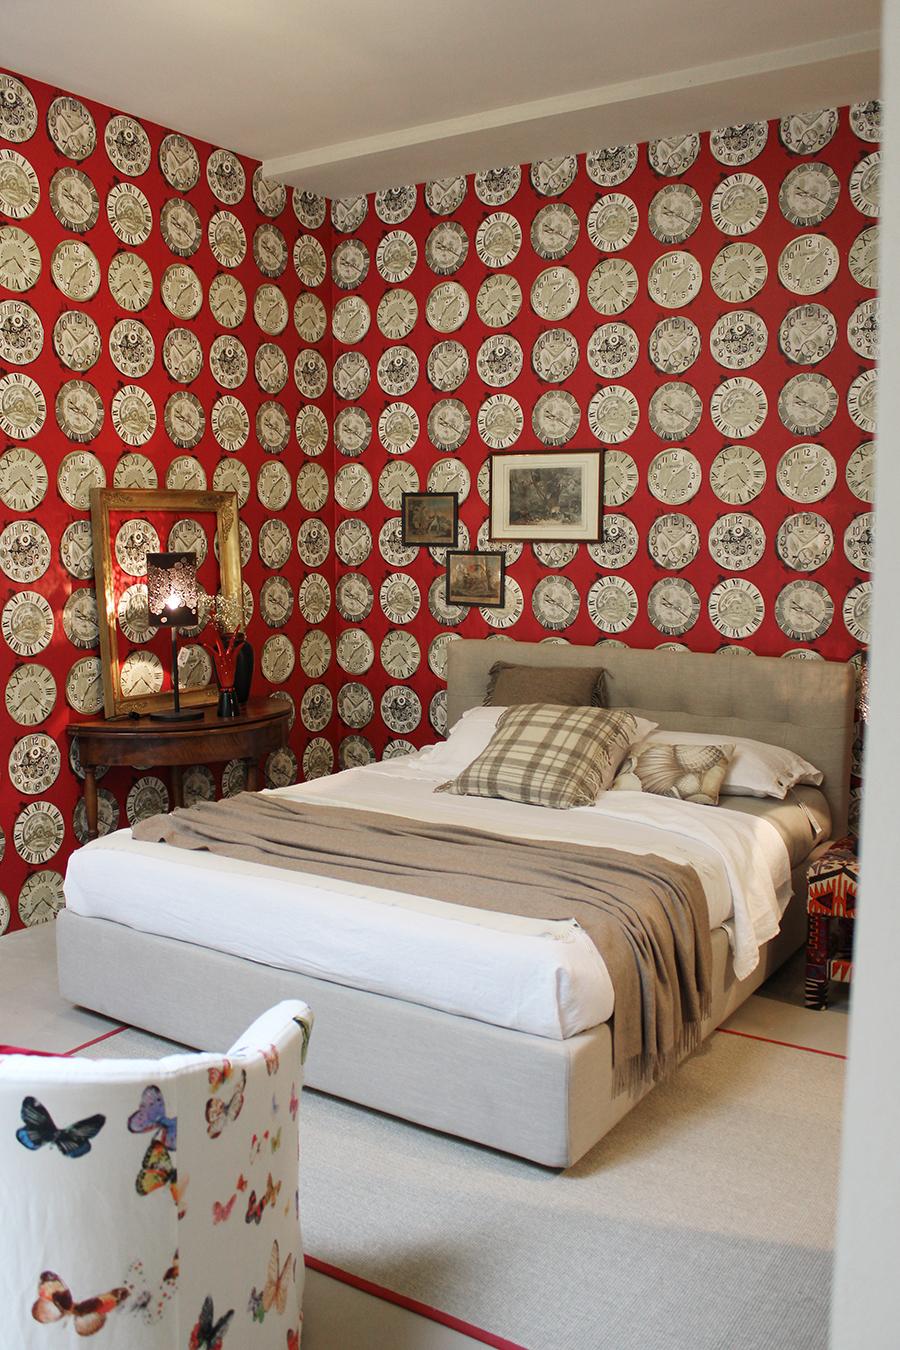 Vibo-wallpaper-prestigious-textiles